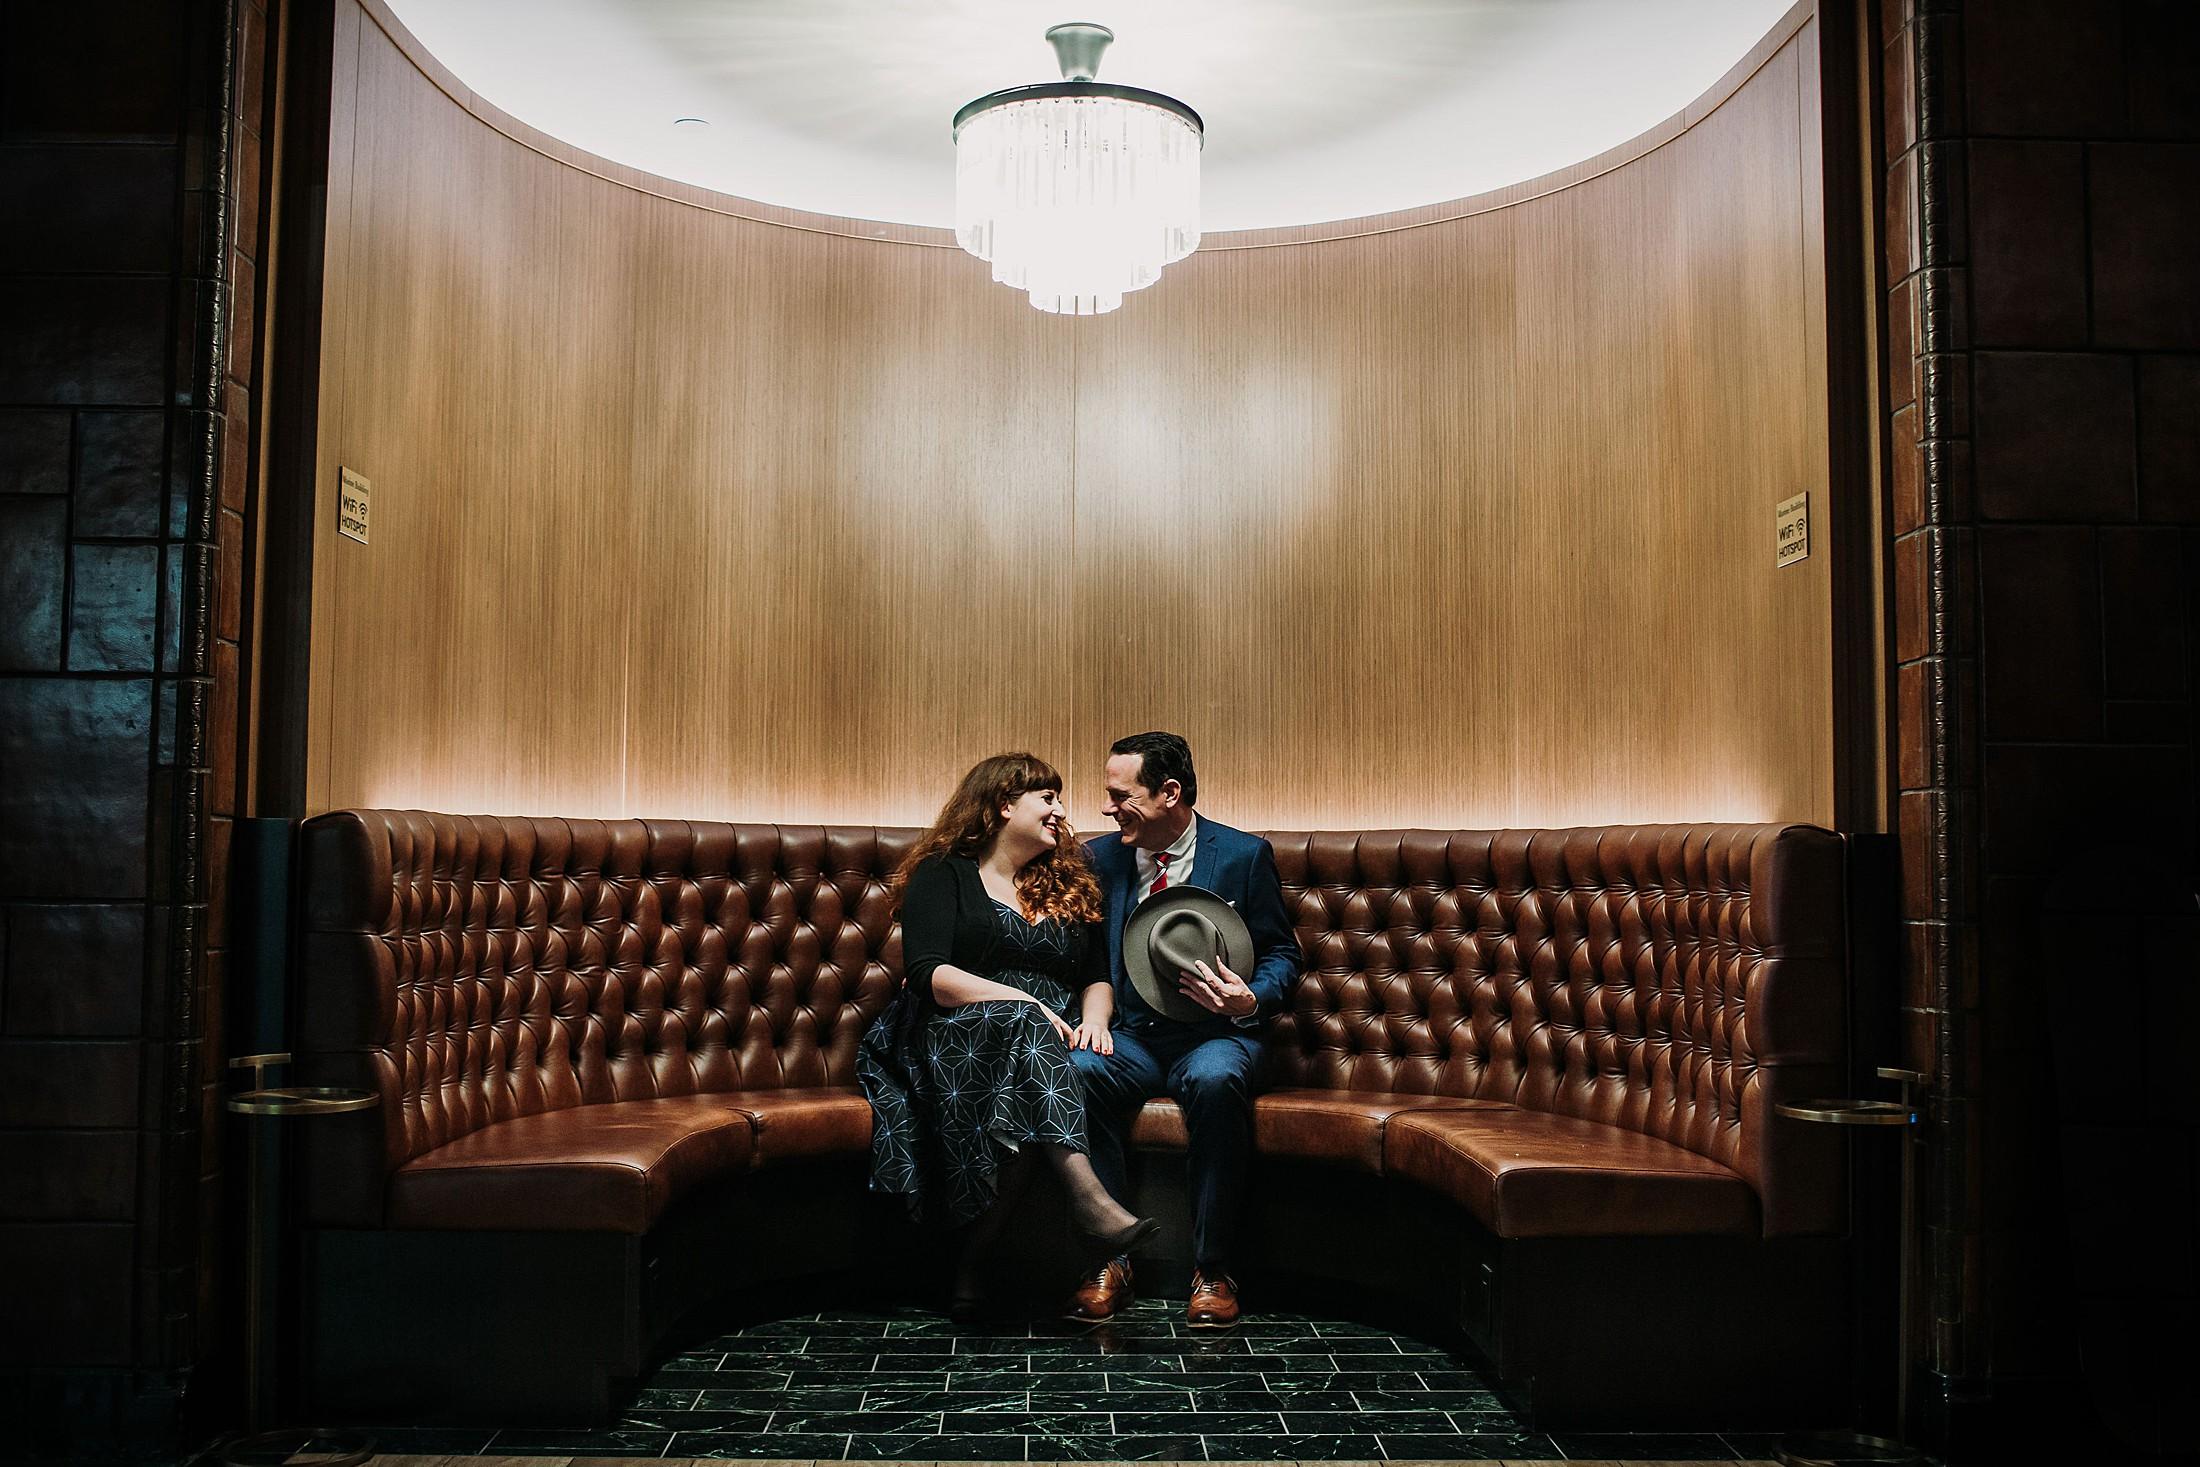 Nov16.RachelJay1175 (1)_Note Photography Documentary Photographer Wedding Photos Vancouver B.C. Gastown Engagement Session Revolver Coffee Blood Alley Vintage Retro Marine Building.jpg